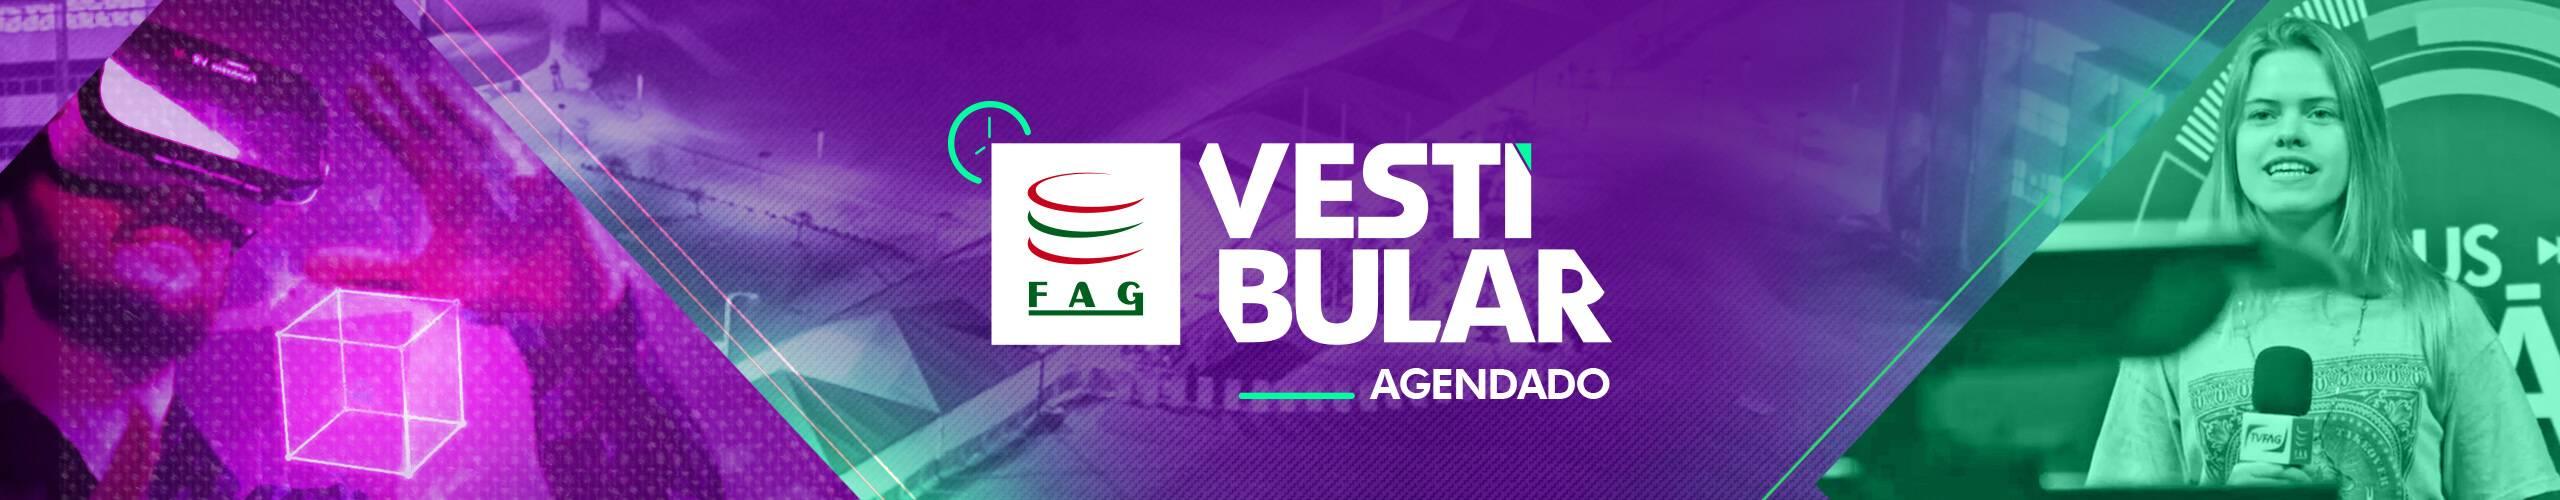 Vestibular Agendado FAG